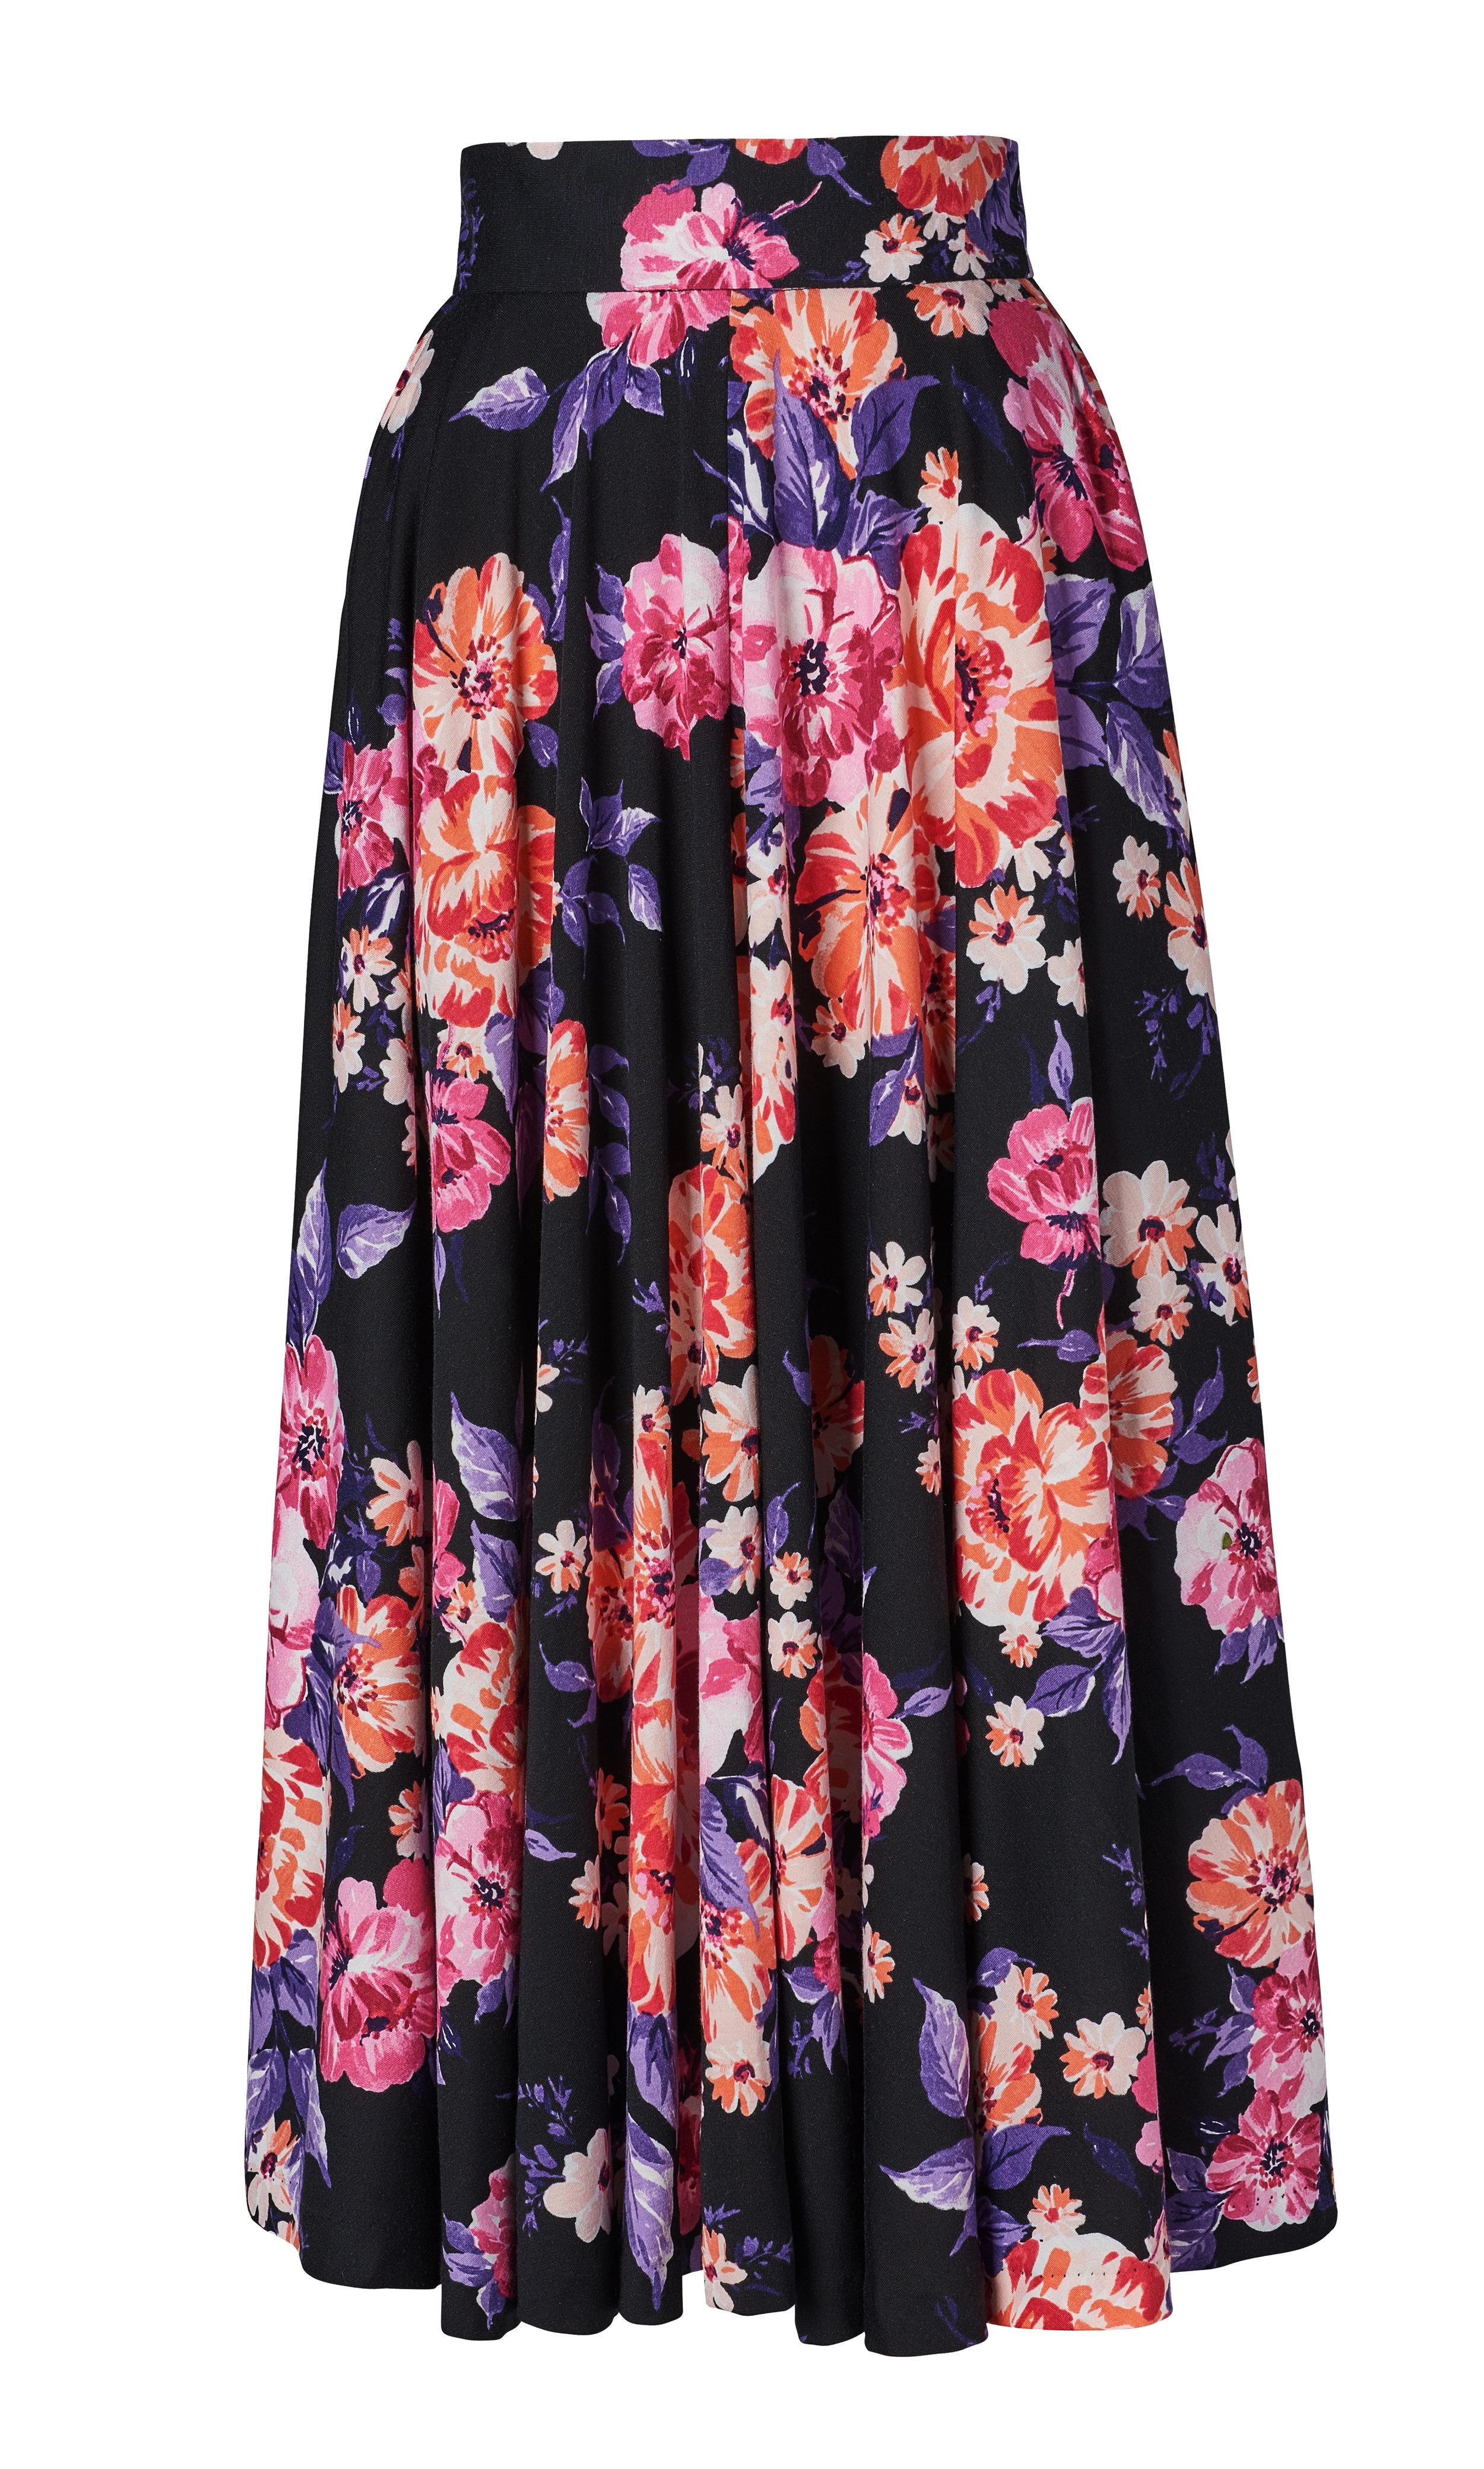 Paradise Found Skirt $280